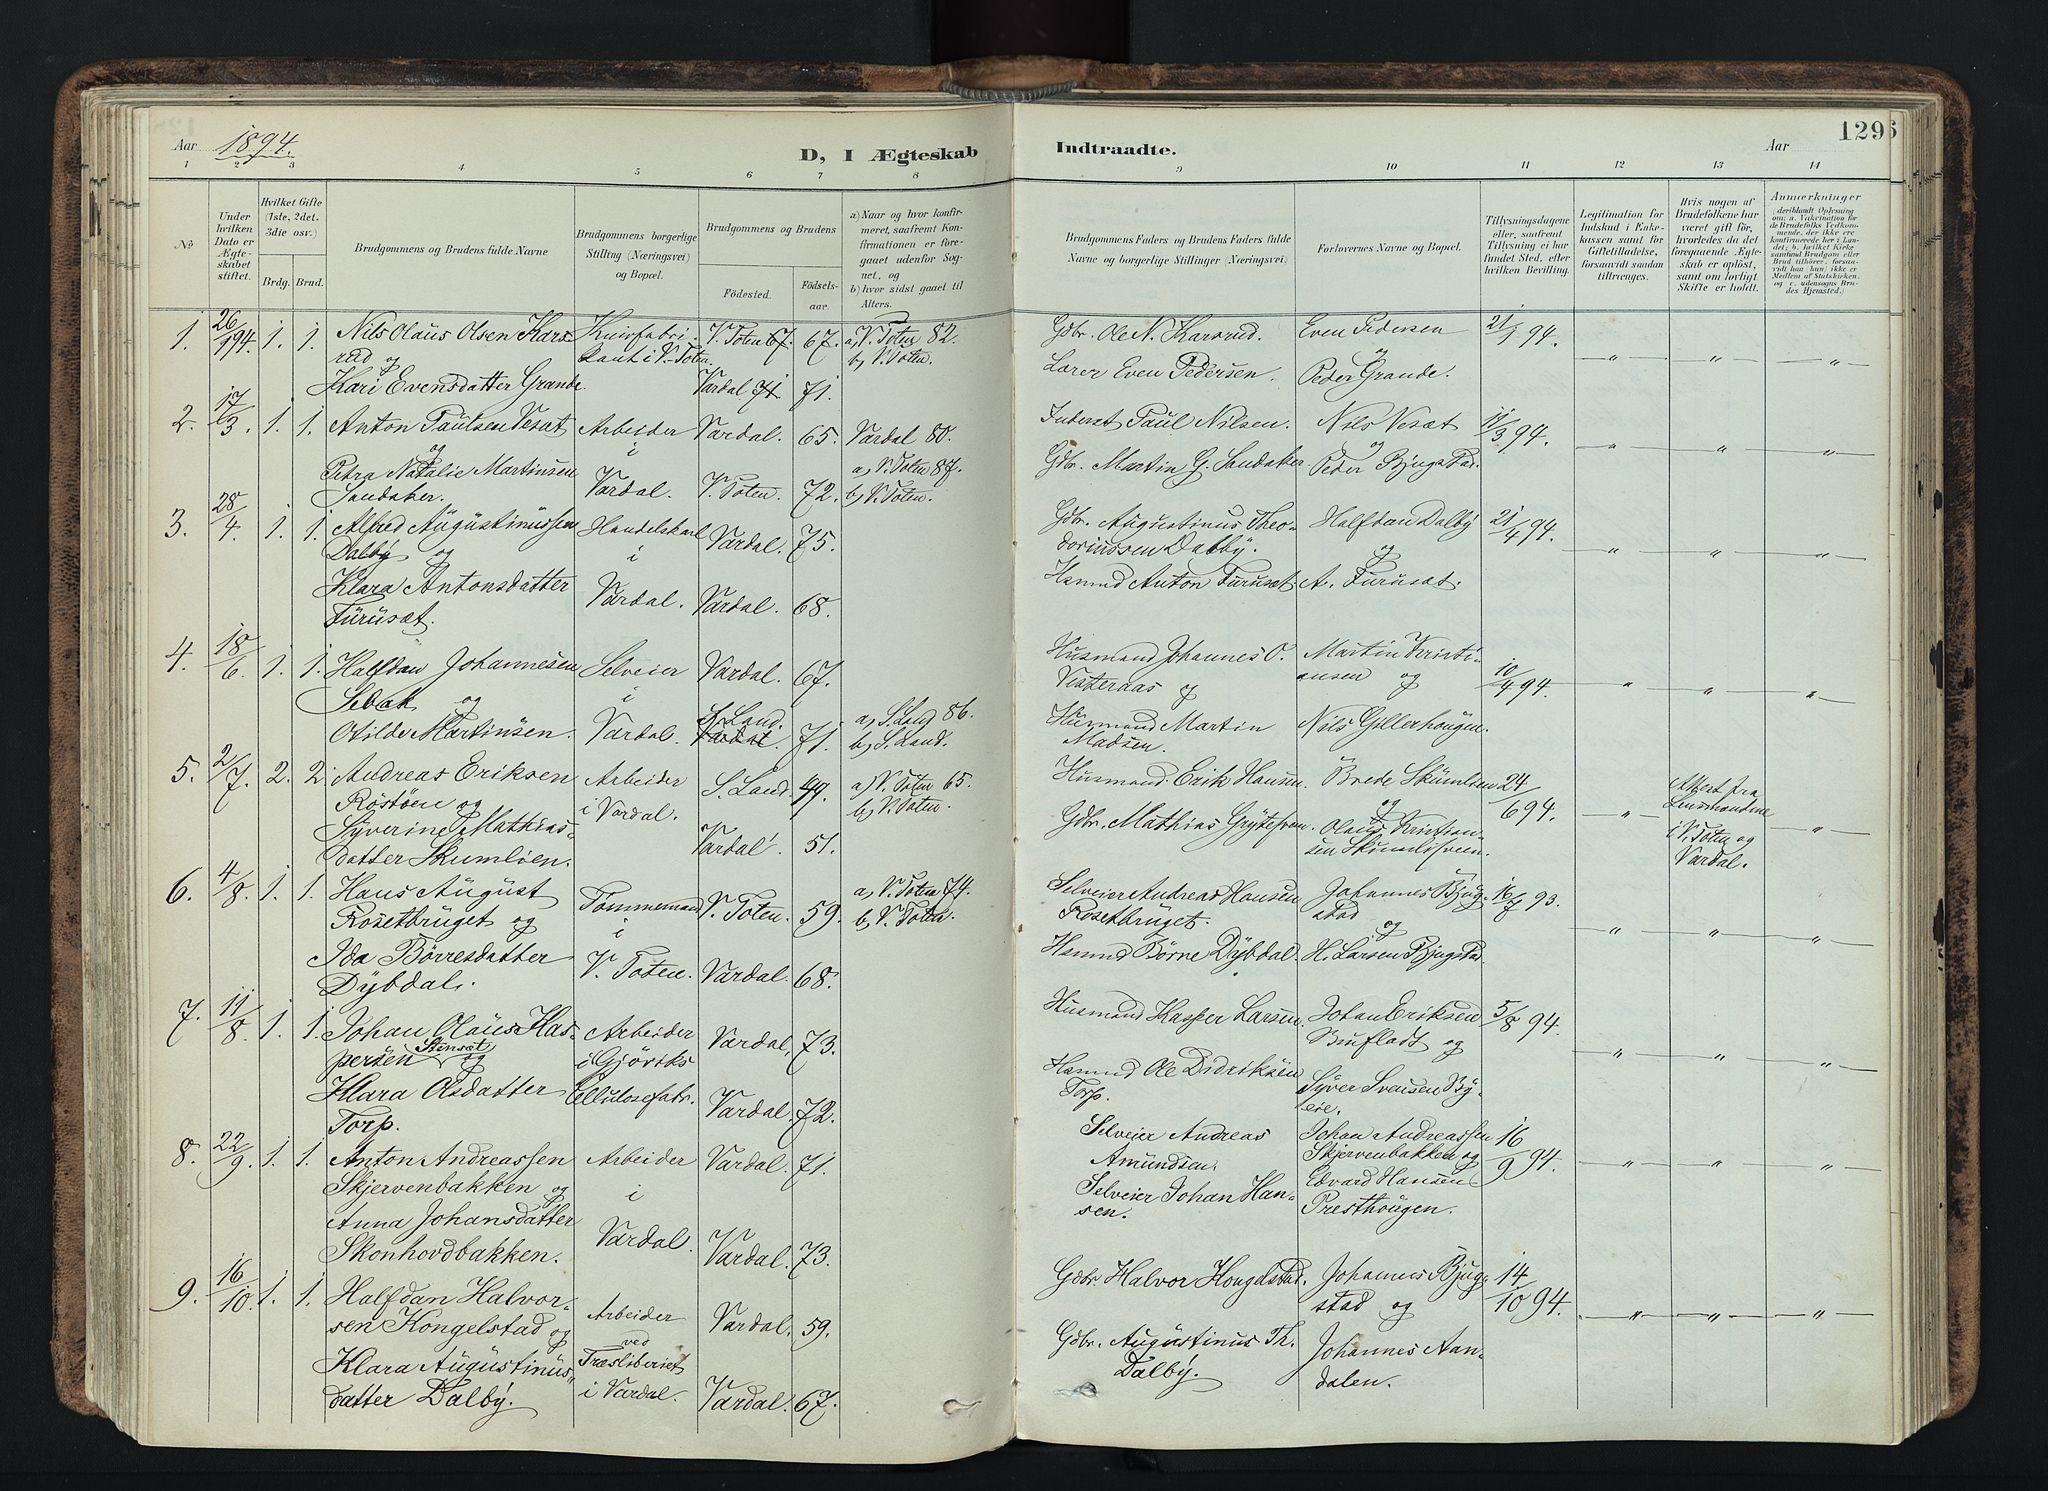 SAH, Vardal prestekontor, H/Ha/Haa/L0019: Ministerialbok nr. 19, 1893-1907, s. 129